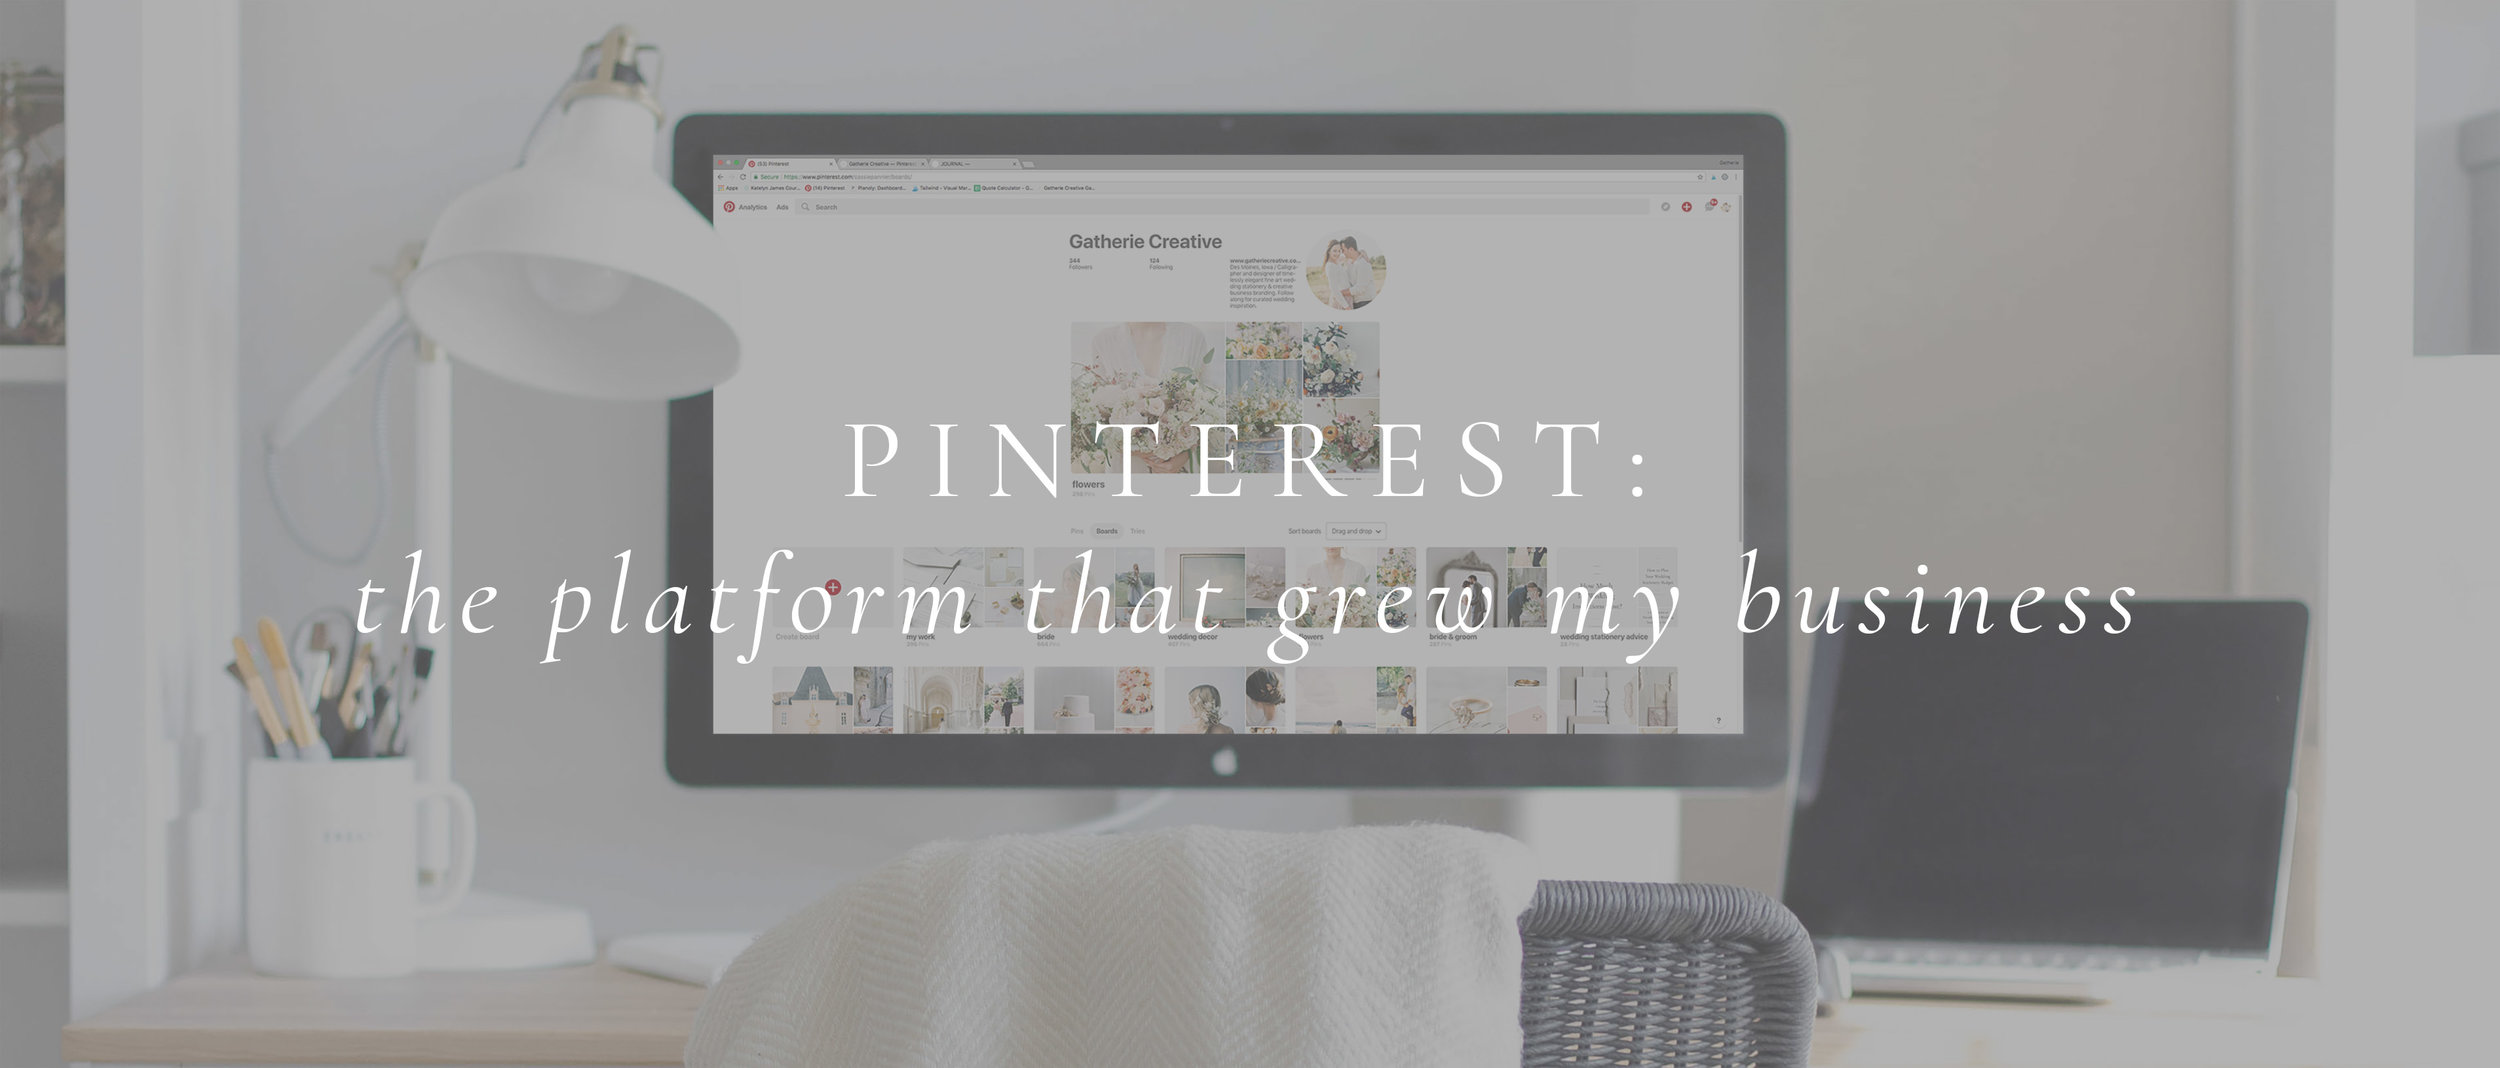 Pinterest_profile_2.png